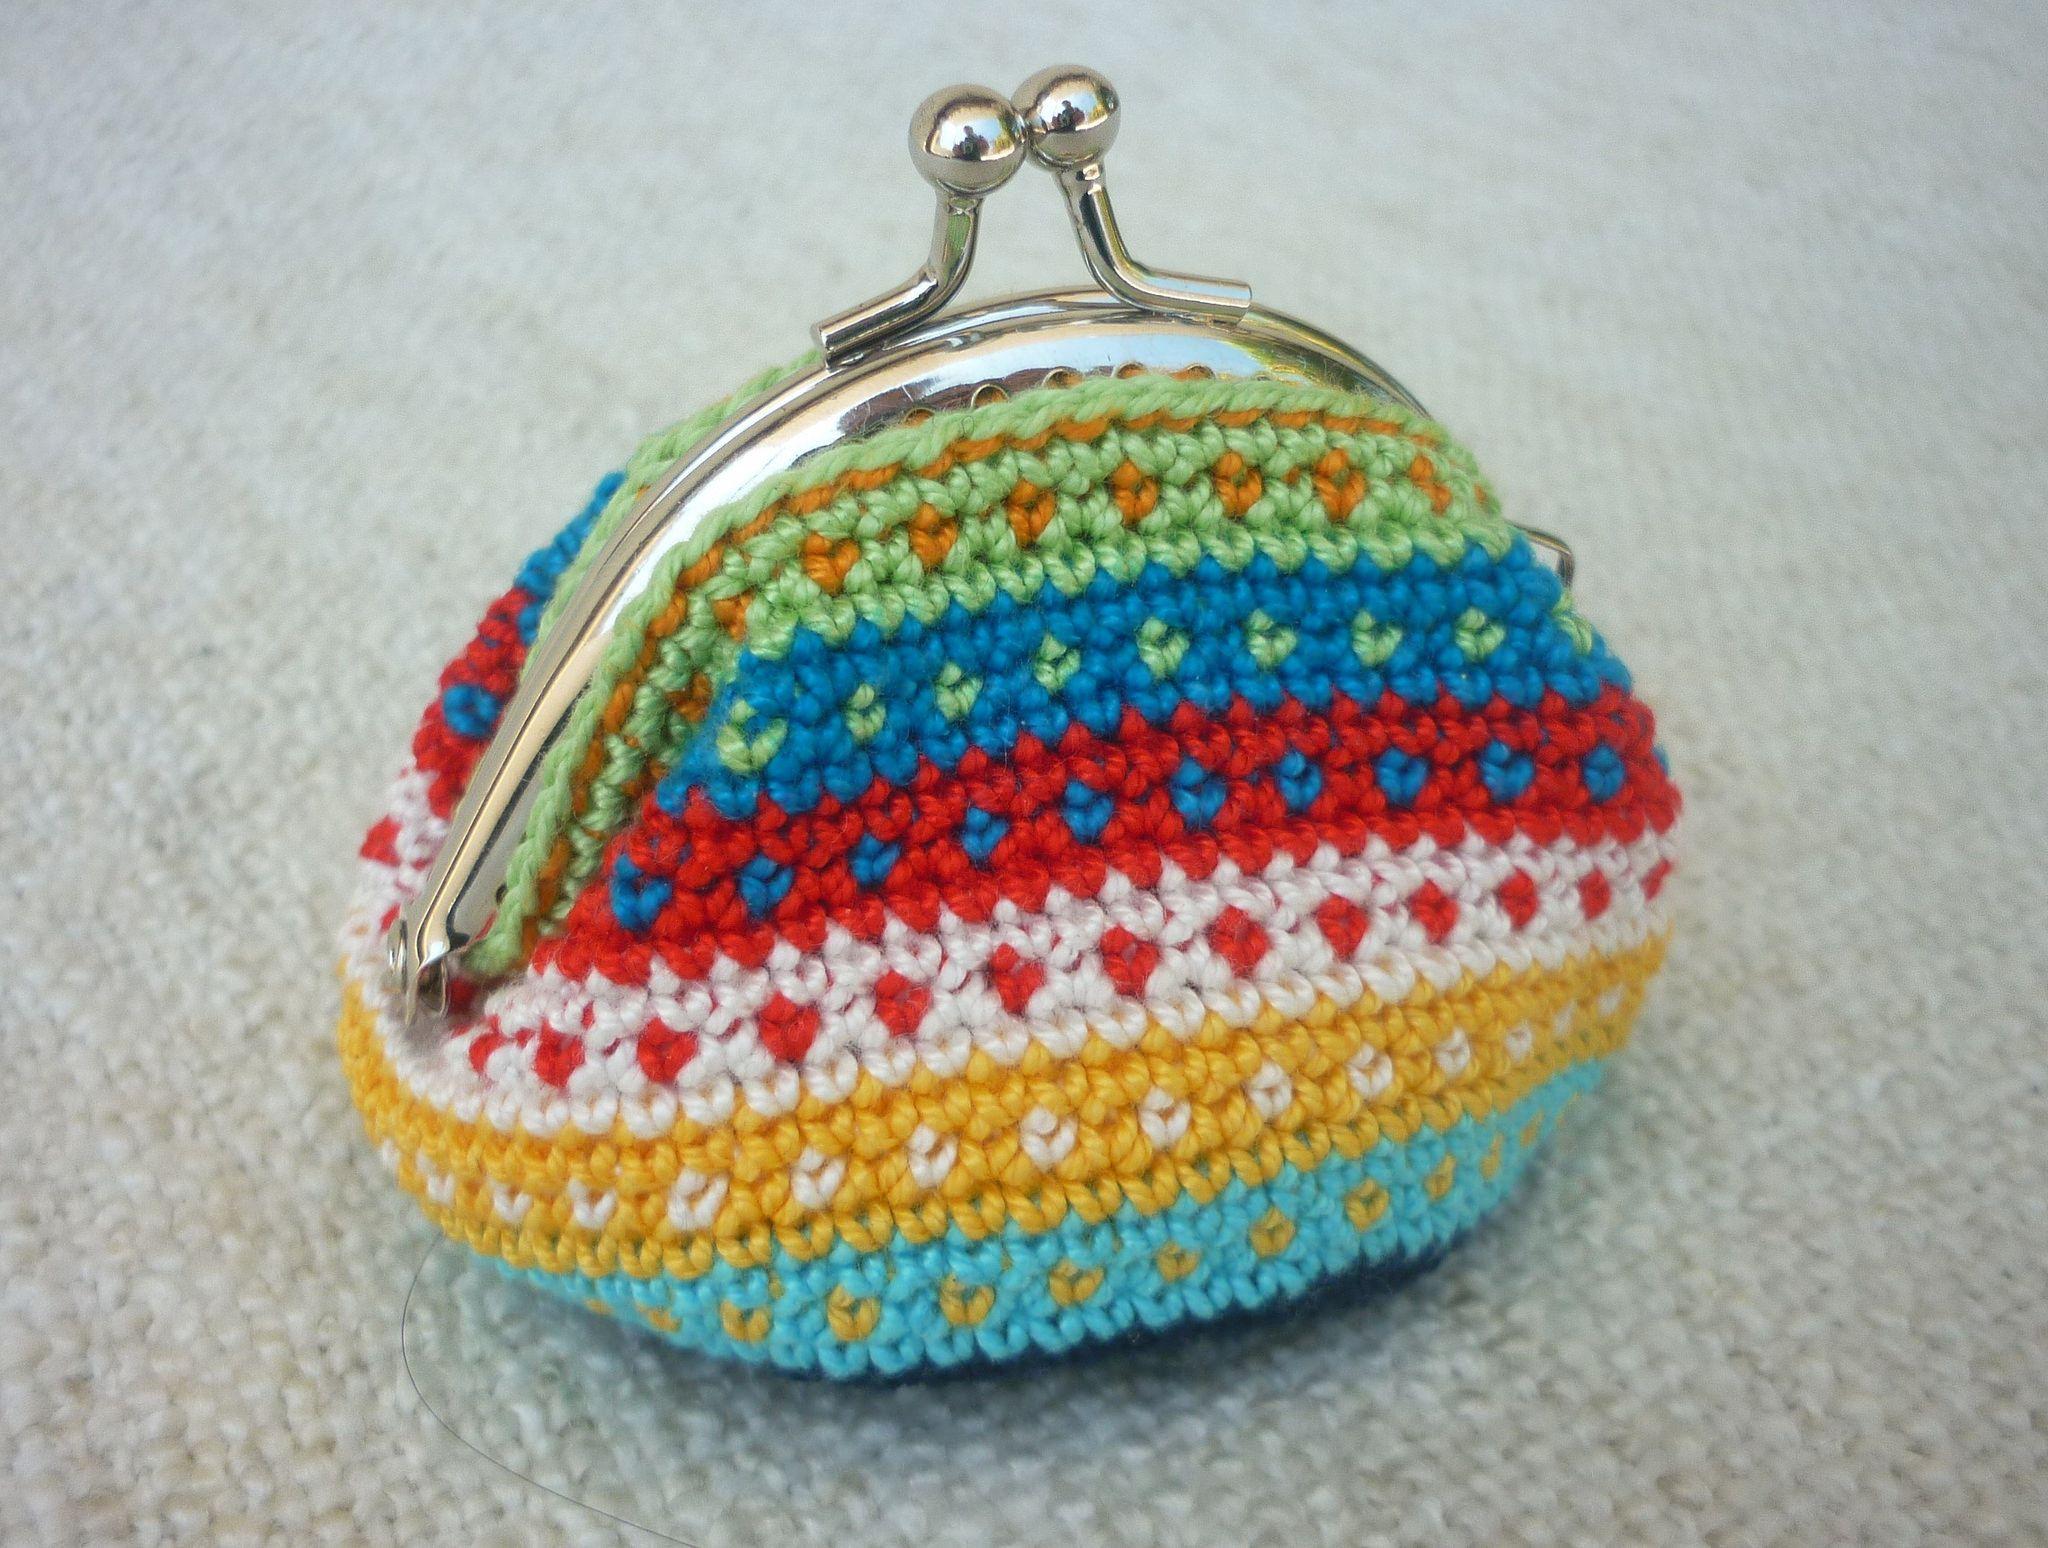 Tapestry Crochet Coin Purse   Pinterest   Gehäkelte taschen, Haken ...